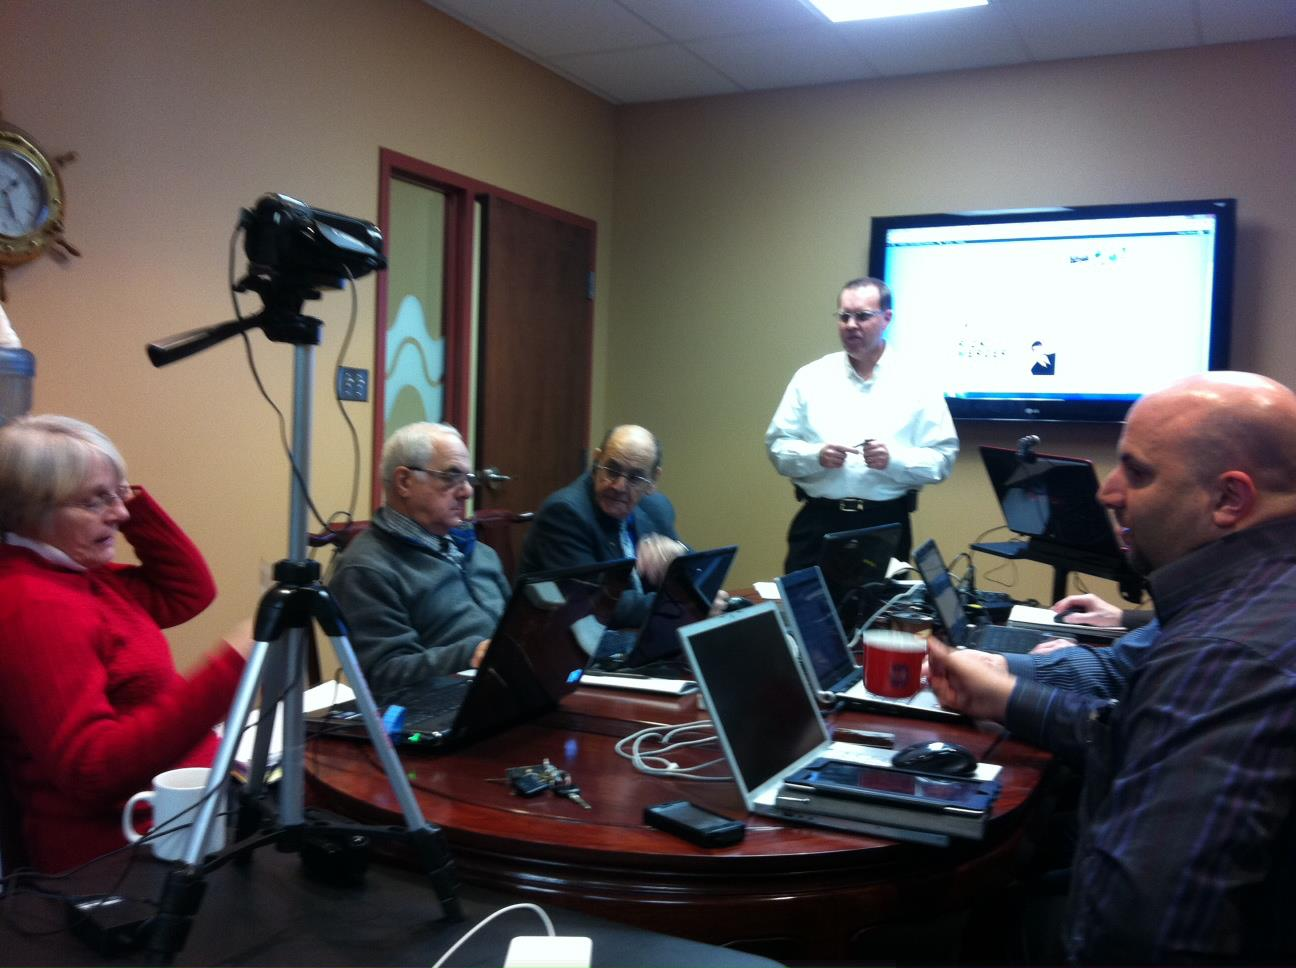 Dartmouth Social Media training for business